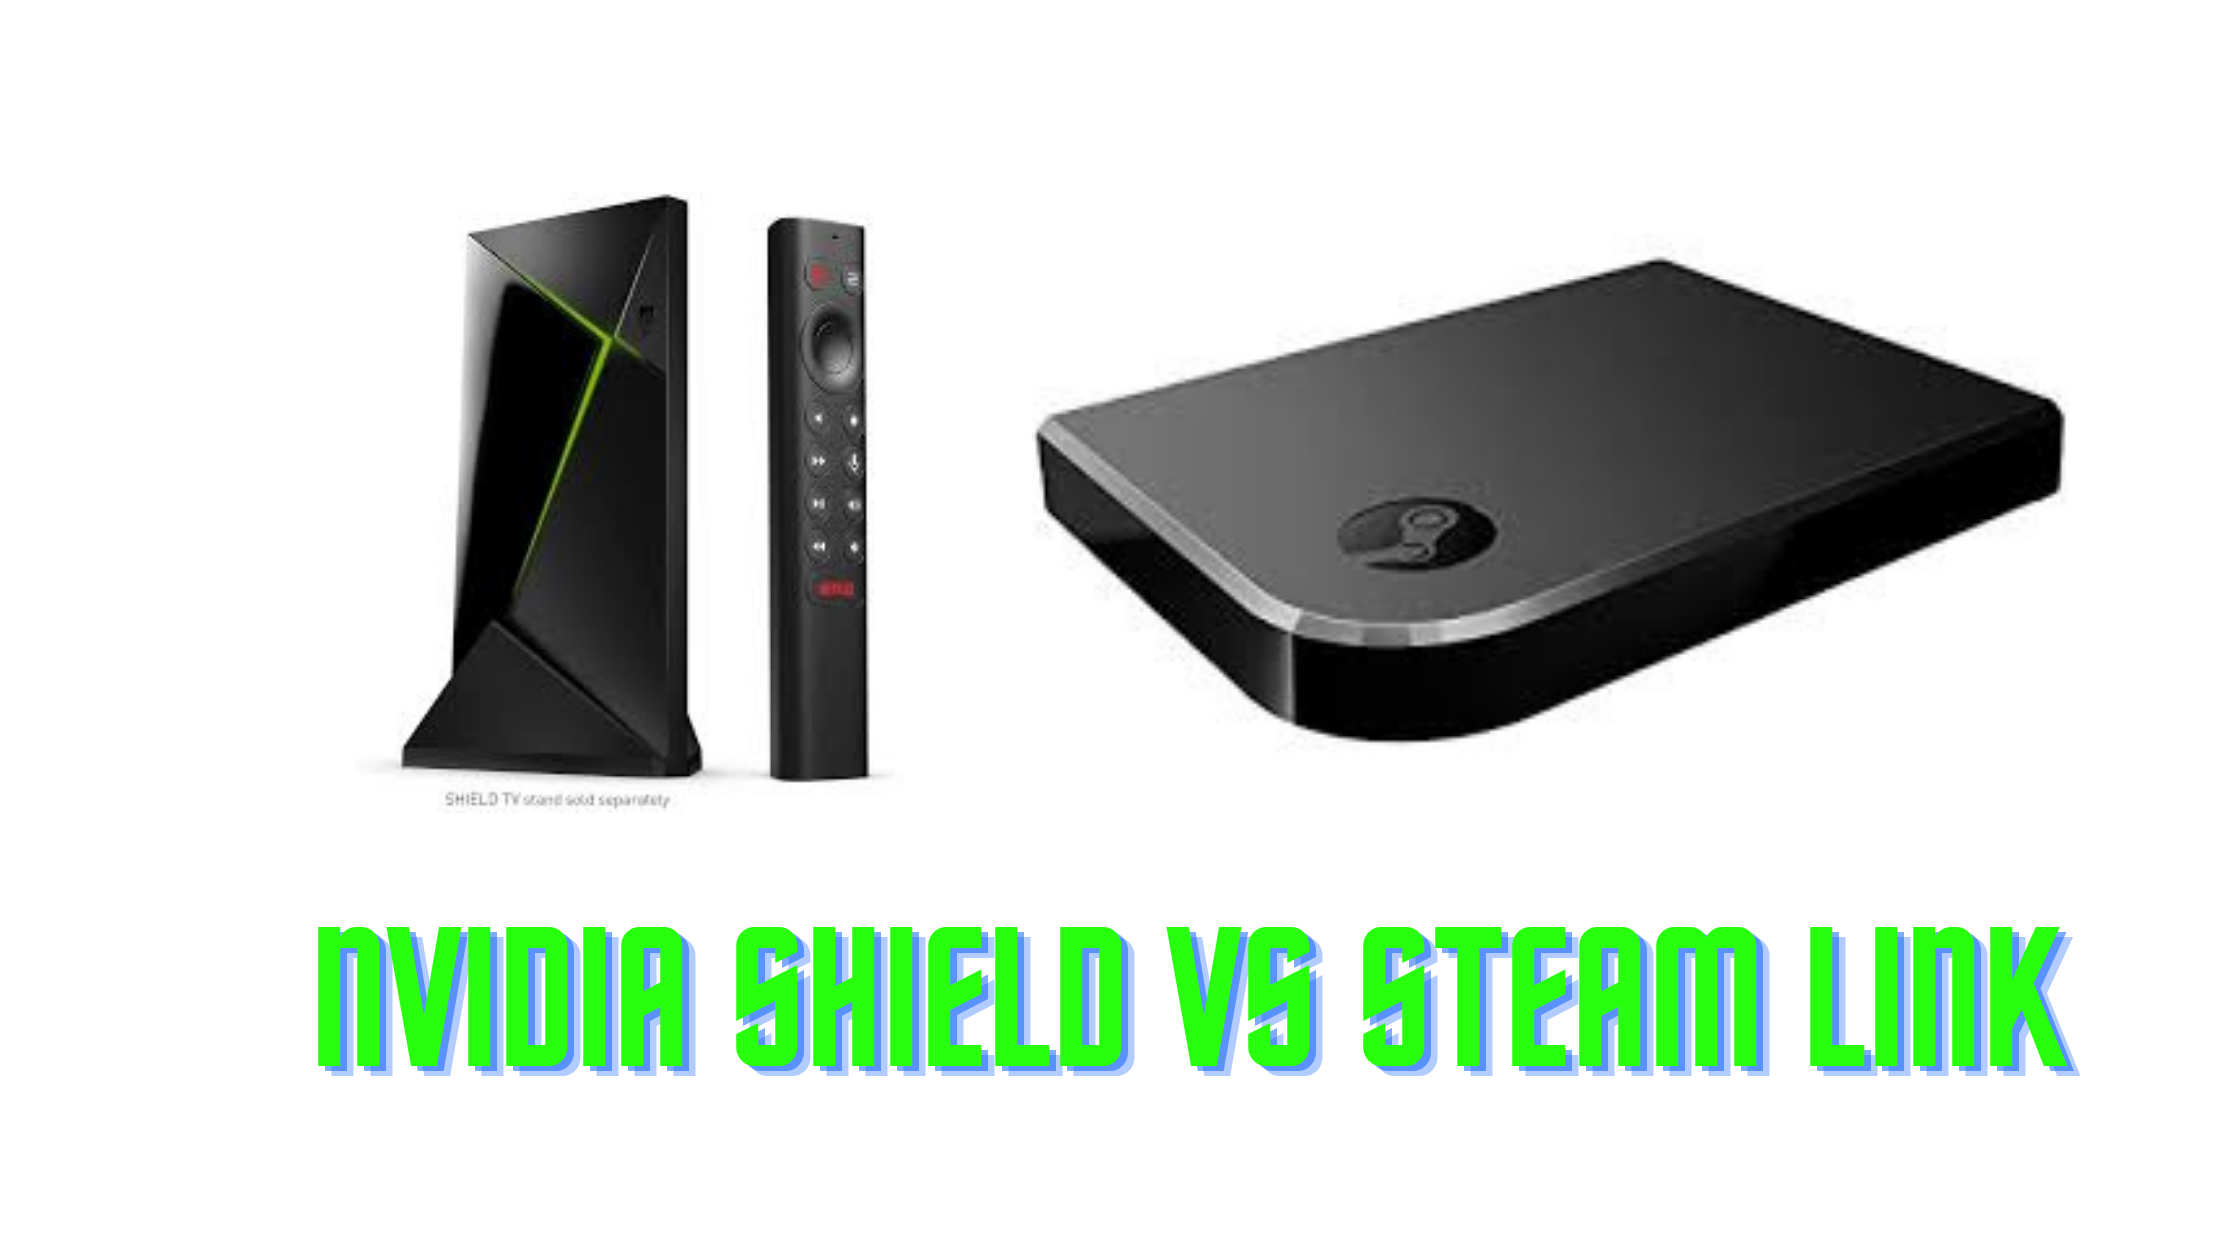 Nvidia shield vs steam link